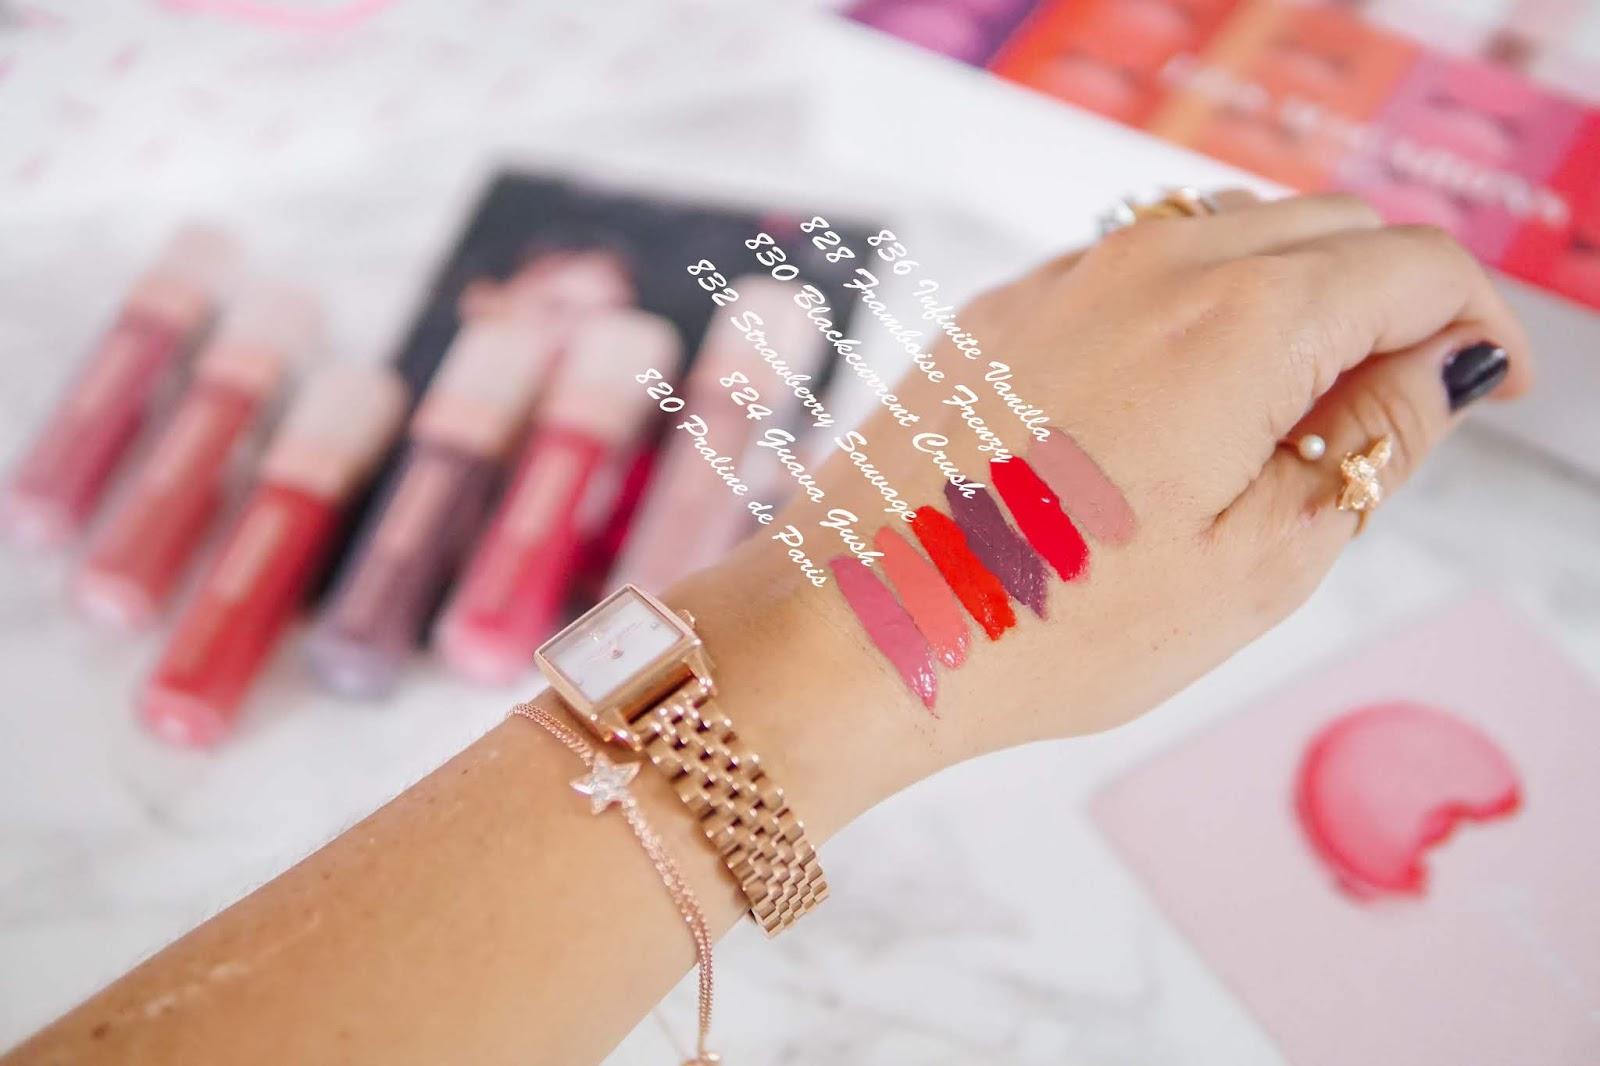 Lippenstift Infaillible Ultra-Matte Les Macarons - fashionstylebyjohanna - lippenstift